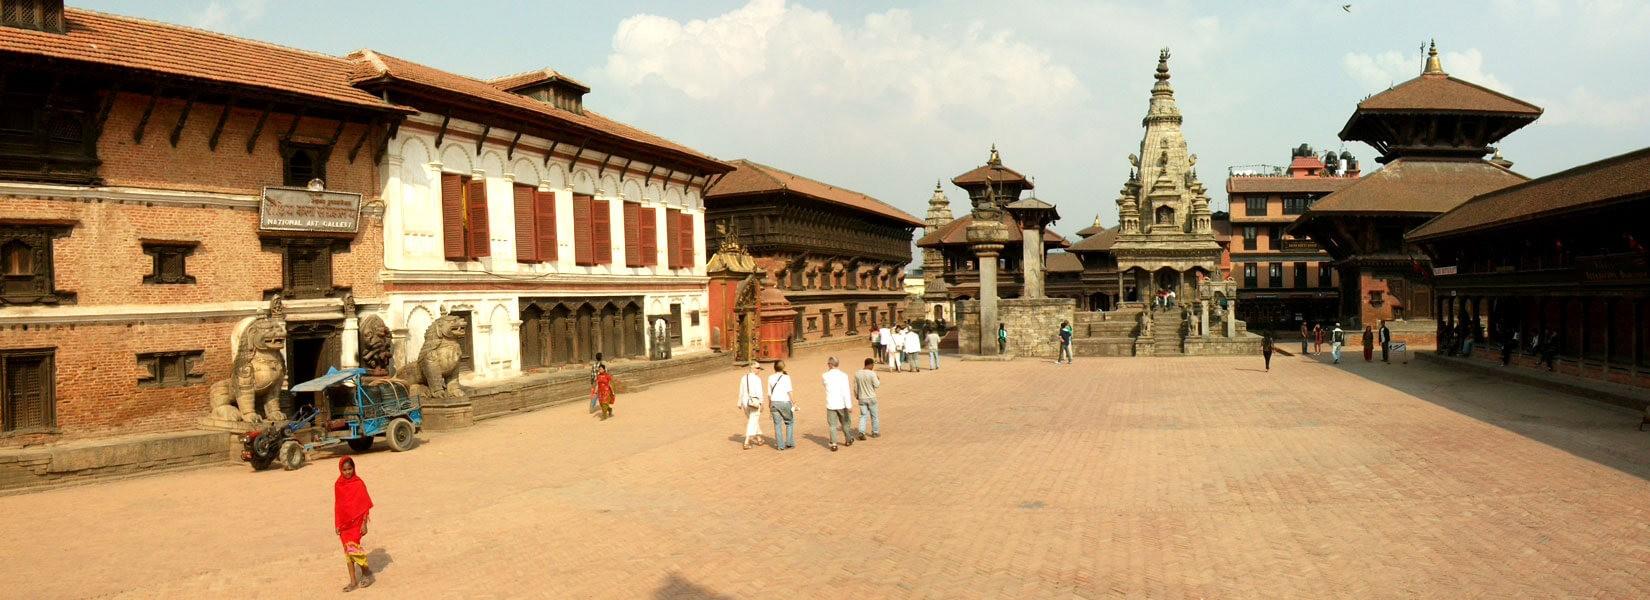 Kathmandu valley Tour, Bhaktapur Durbar Square, Temples of ancient Nepal, Kathmandu day tour